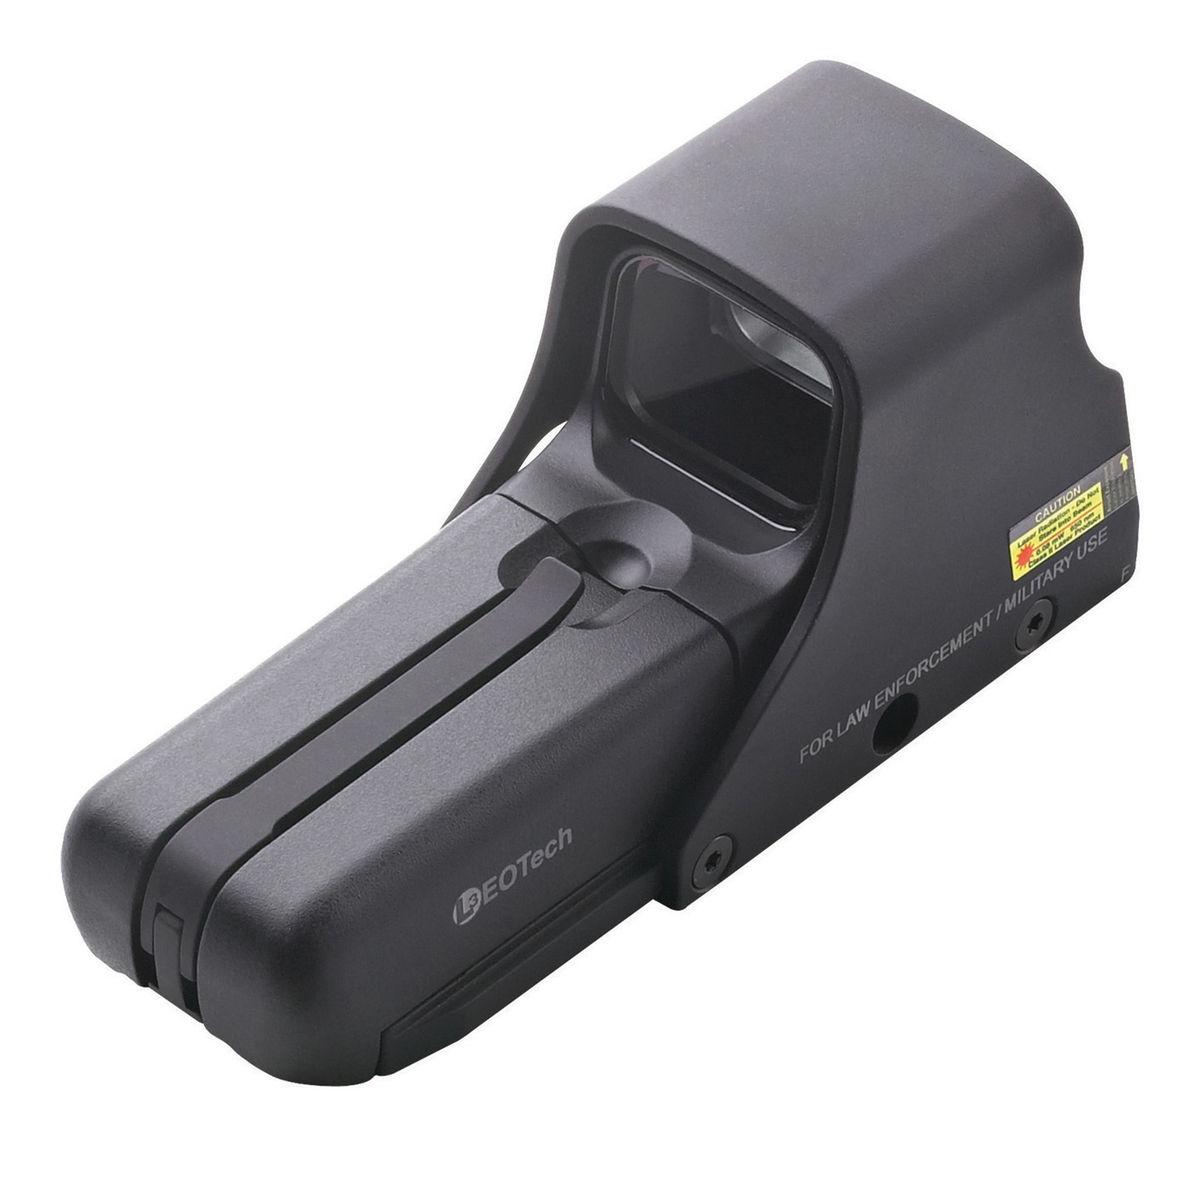 L-3 Eotech Genuine 512 Holographic Weapon Sight - AA Batt...